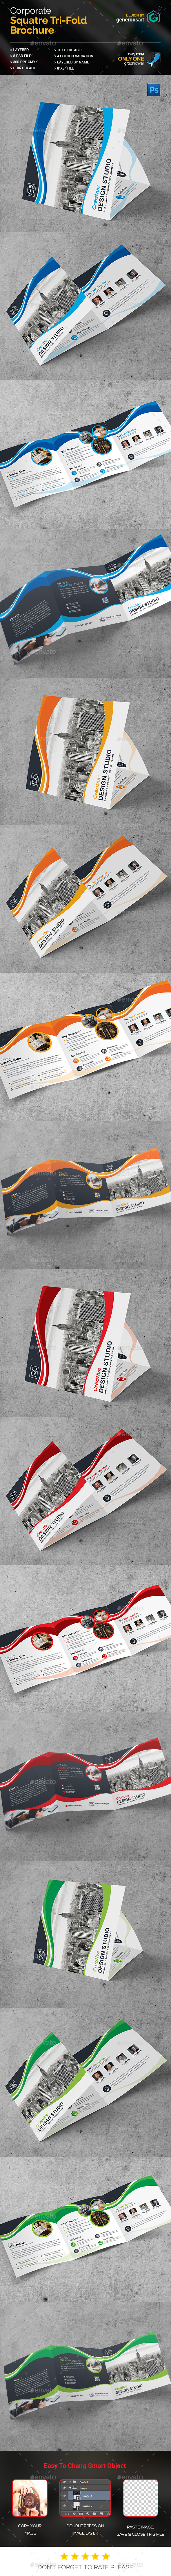 New_Square Tri-Fold Brochure - Corporate Brochures